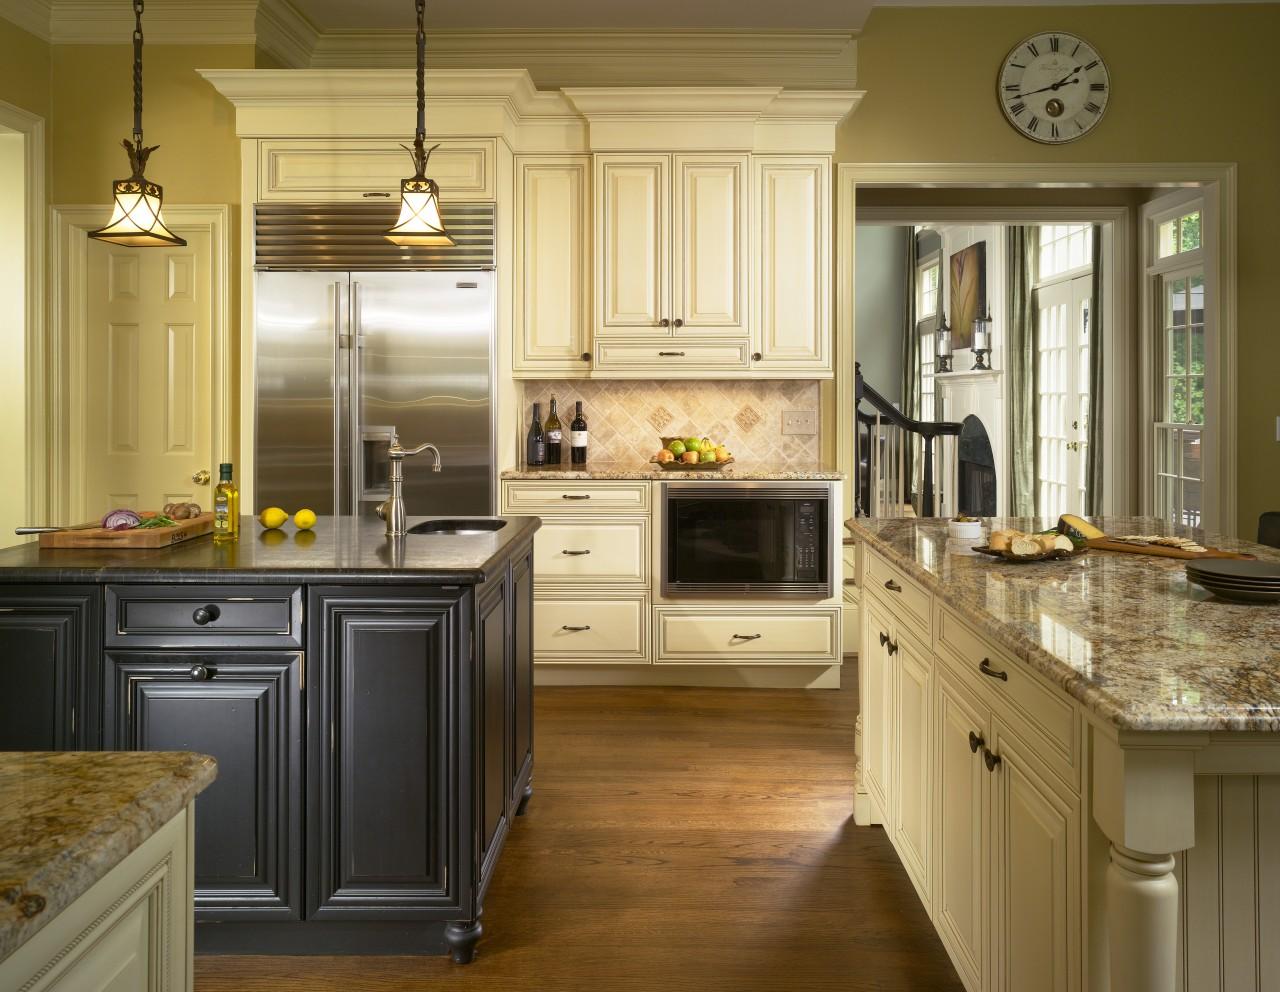 View of kitchen which features kitchen island with cabinetry, countertop, cuisine classique, floor, flooring, hardwood, interior design, kitchen, room, wood flooring, brown